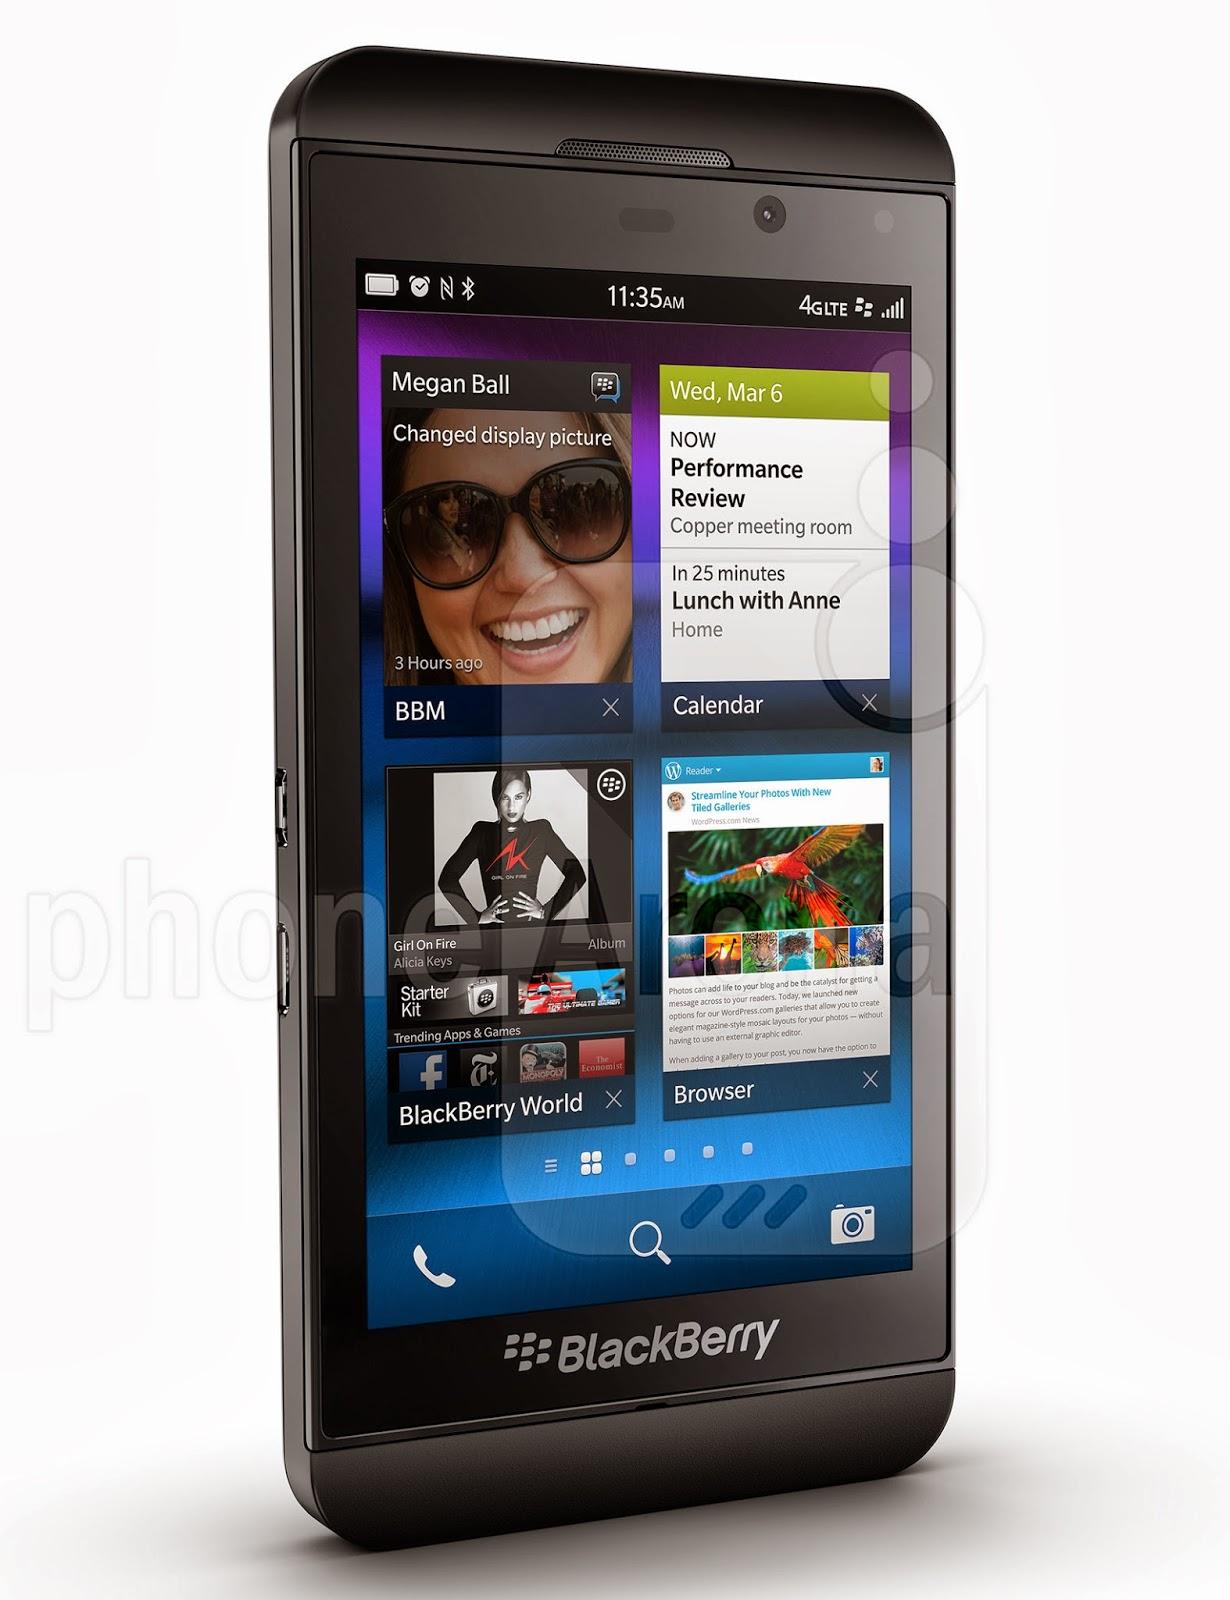 blackberryhub ikeja blackberry z10 nigeria n47 000 call 08032271102. Black Bedroom Furniture Sets. Home Design Ideas